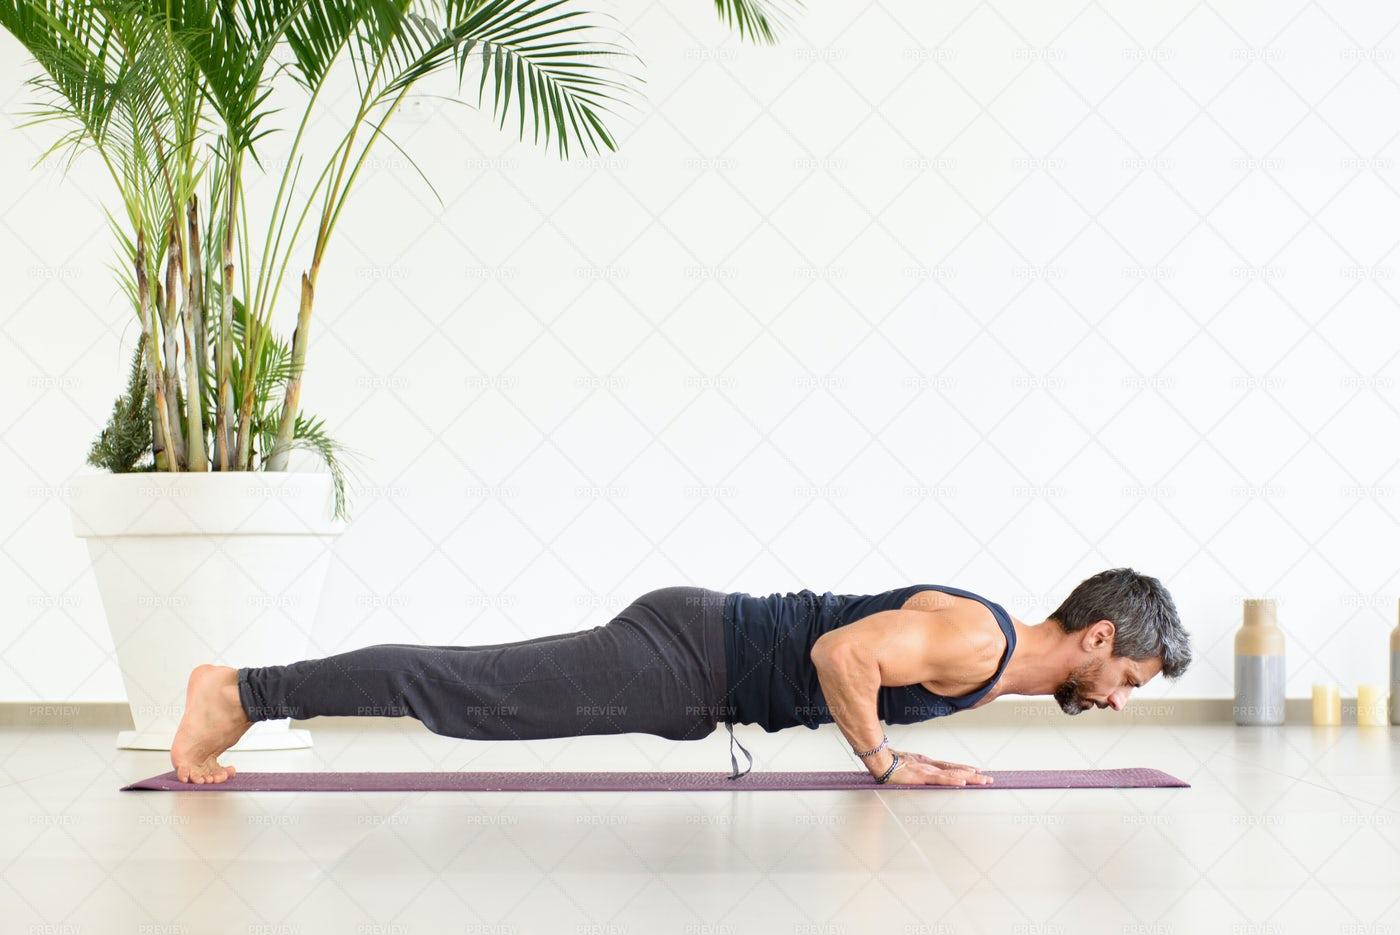 Yoga Chaturanga Push-ups: Stock Photos